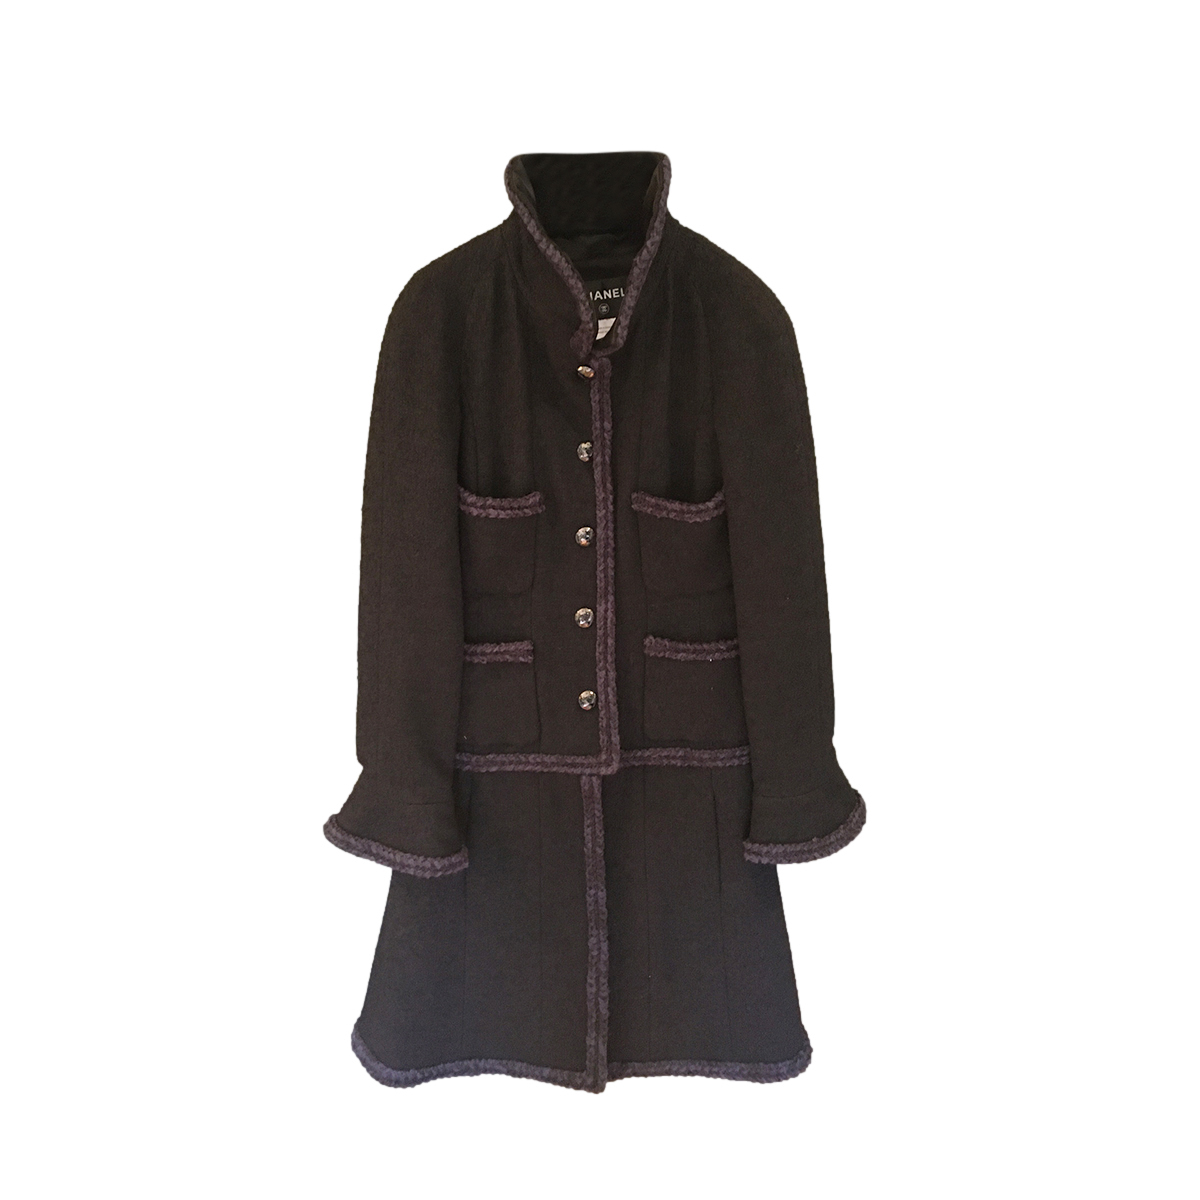 Chanel Black Tweed Trimmed Wool Blend Coat